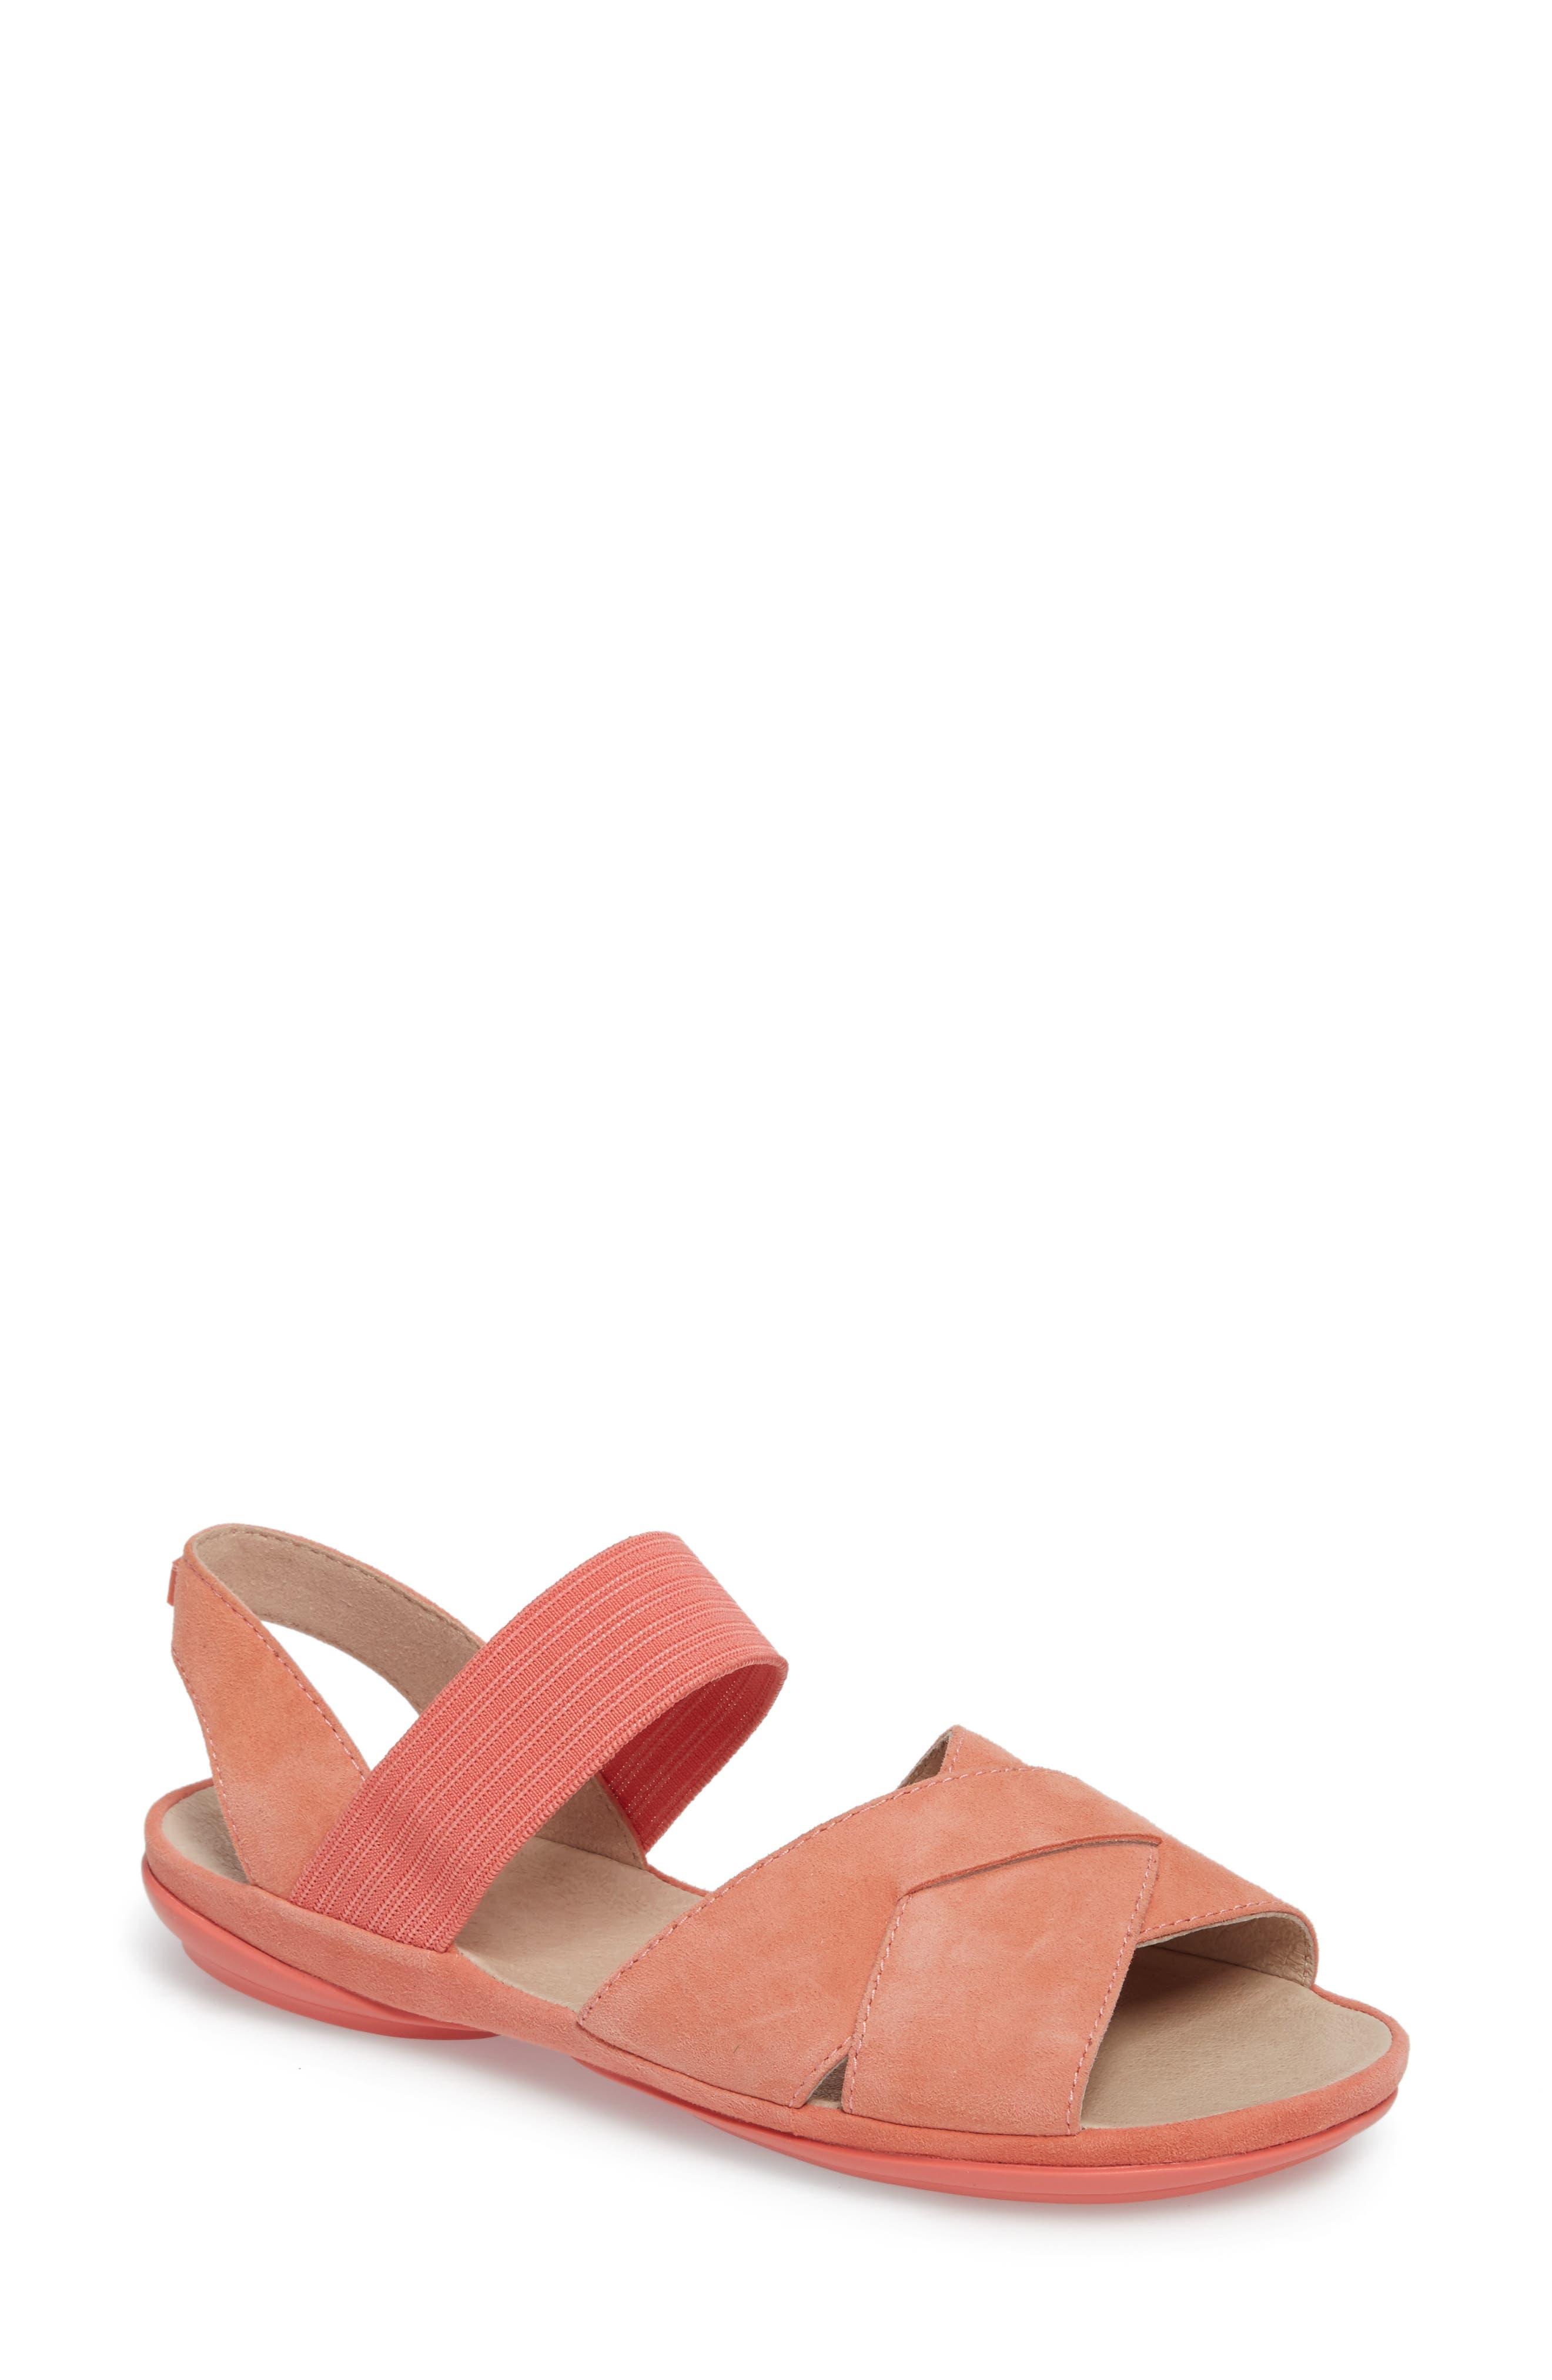 Right Nina Flat Cross Strap Sandal,                         Main,                         color, Medium Pink Leather